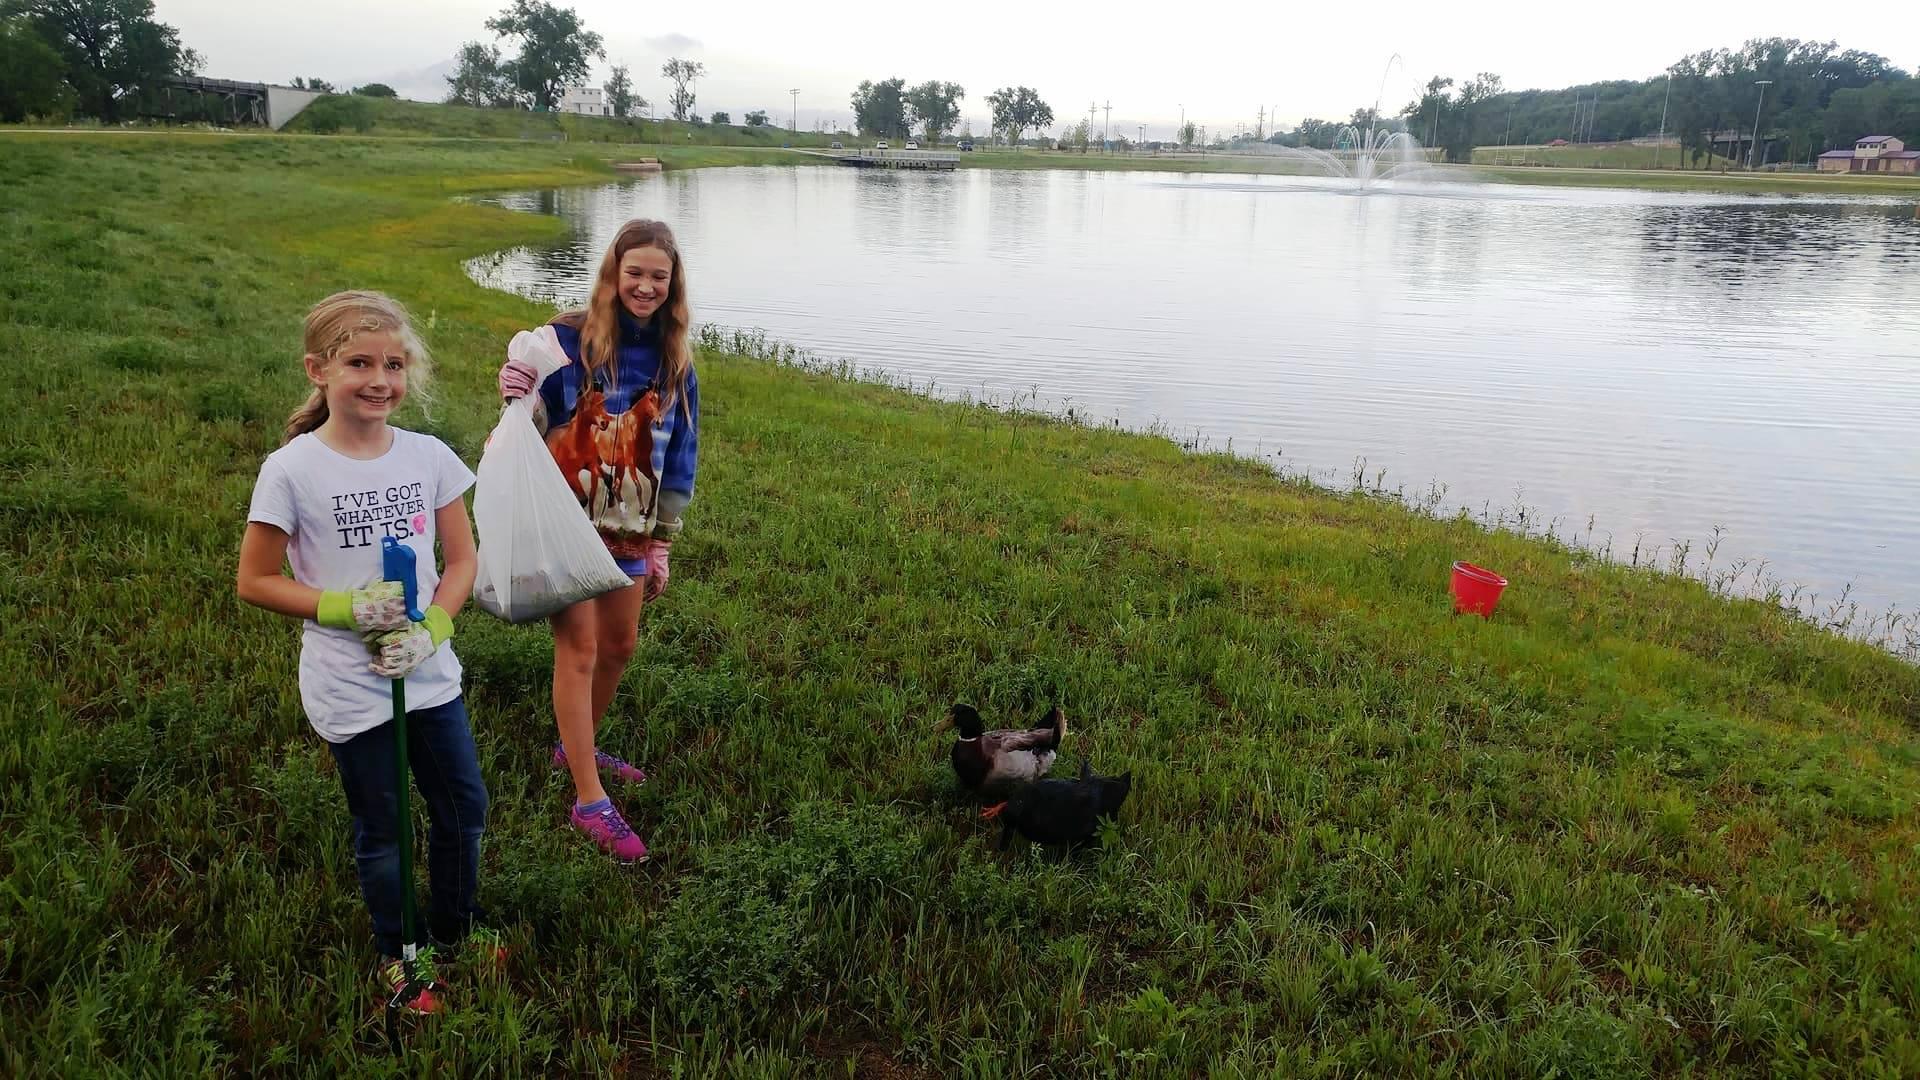 Litter Around the Pond